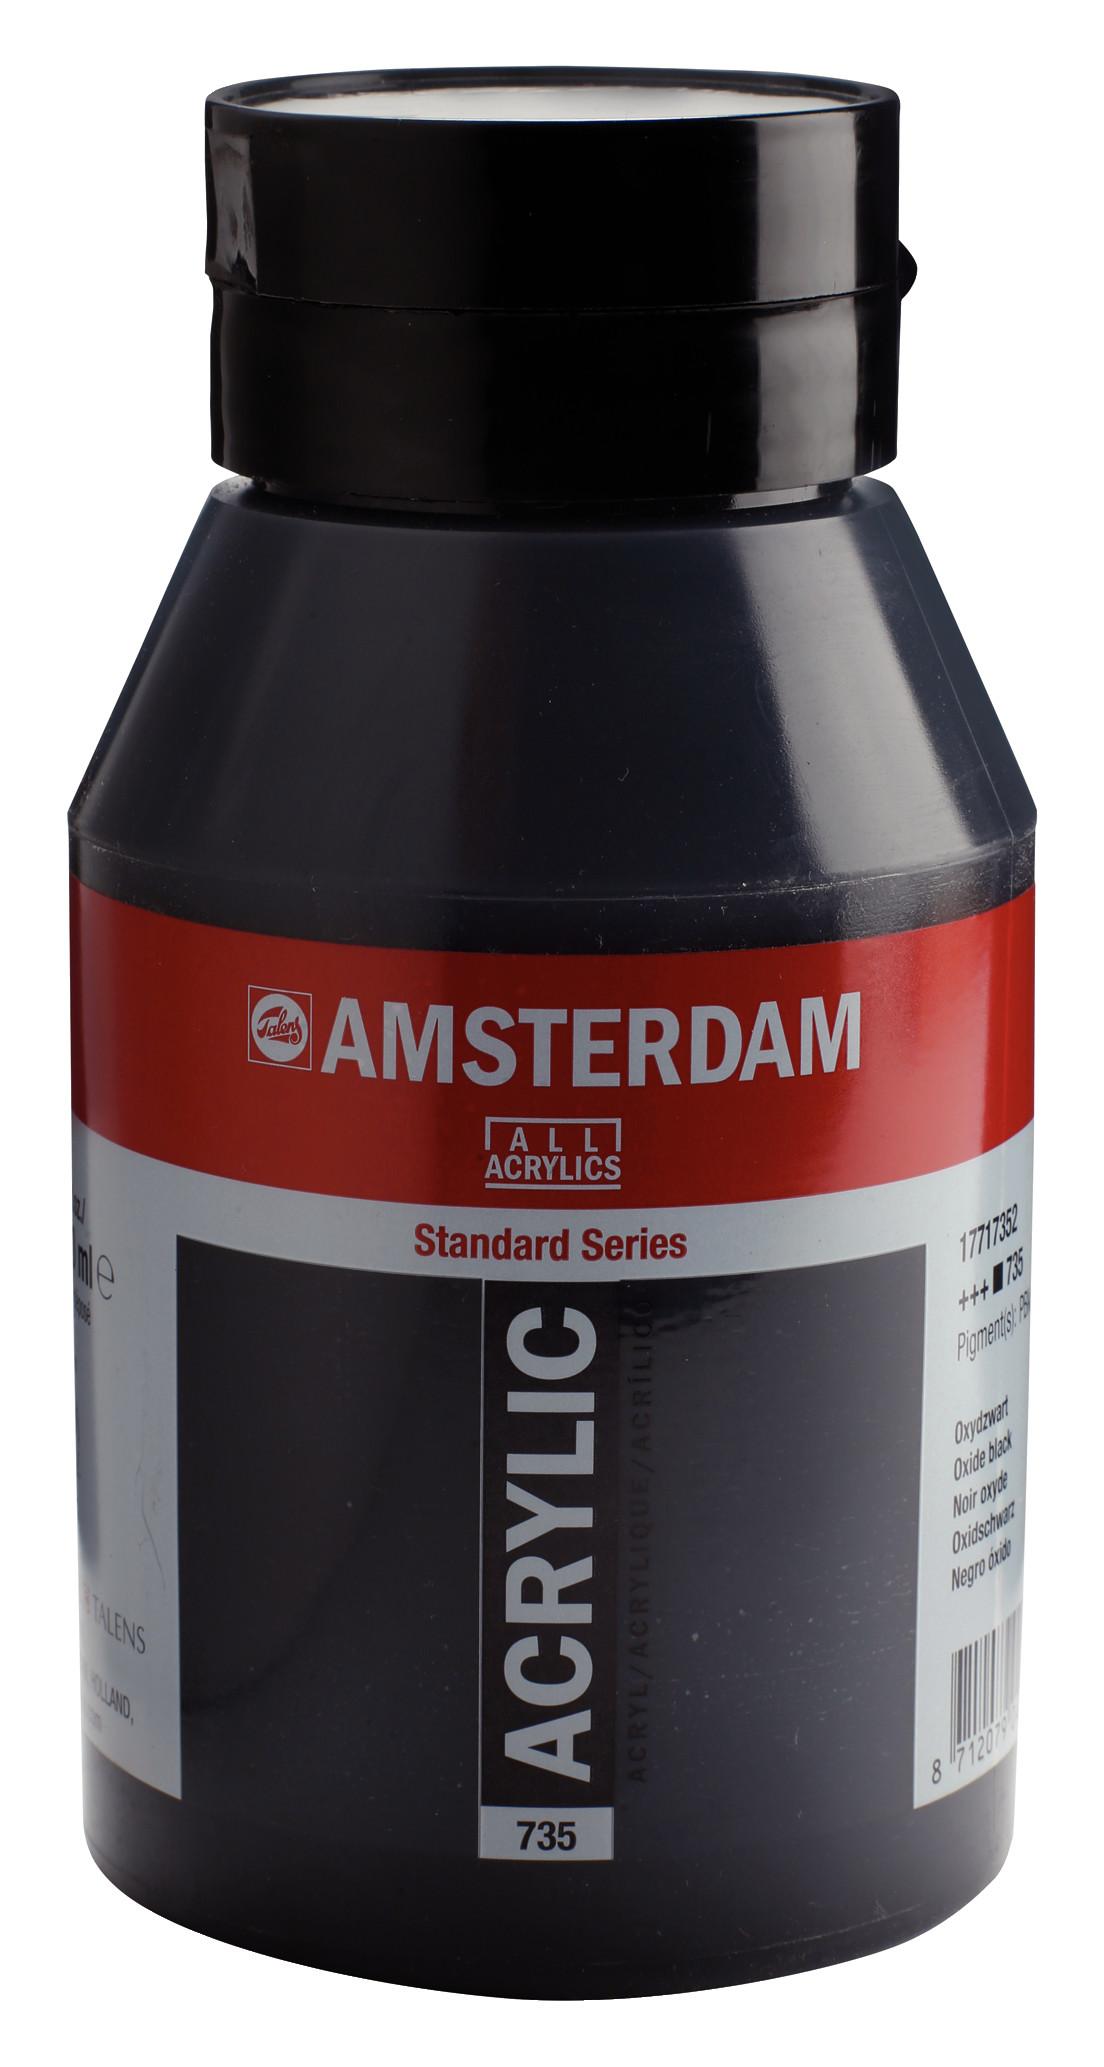 Amsterdam Standard Series Acrylic Jar 1000 ml Oxide black 735